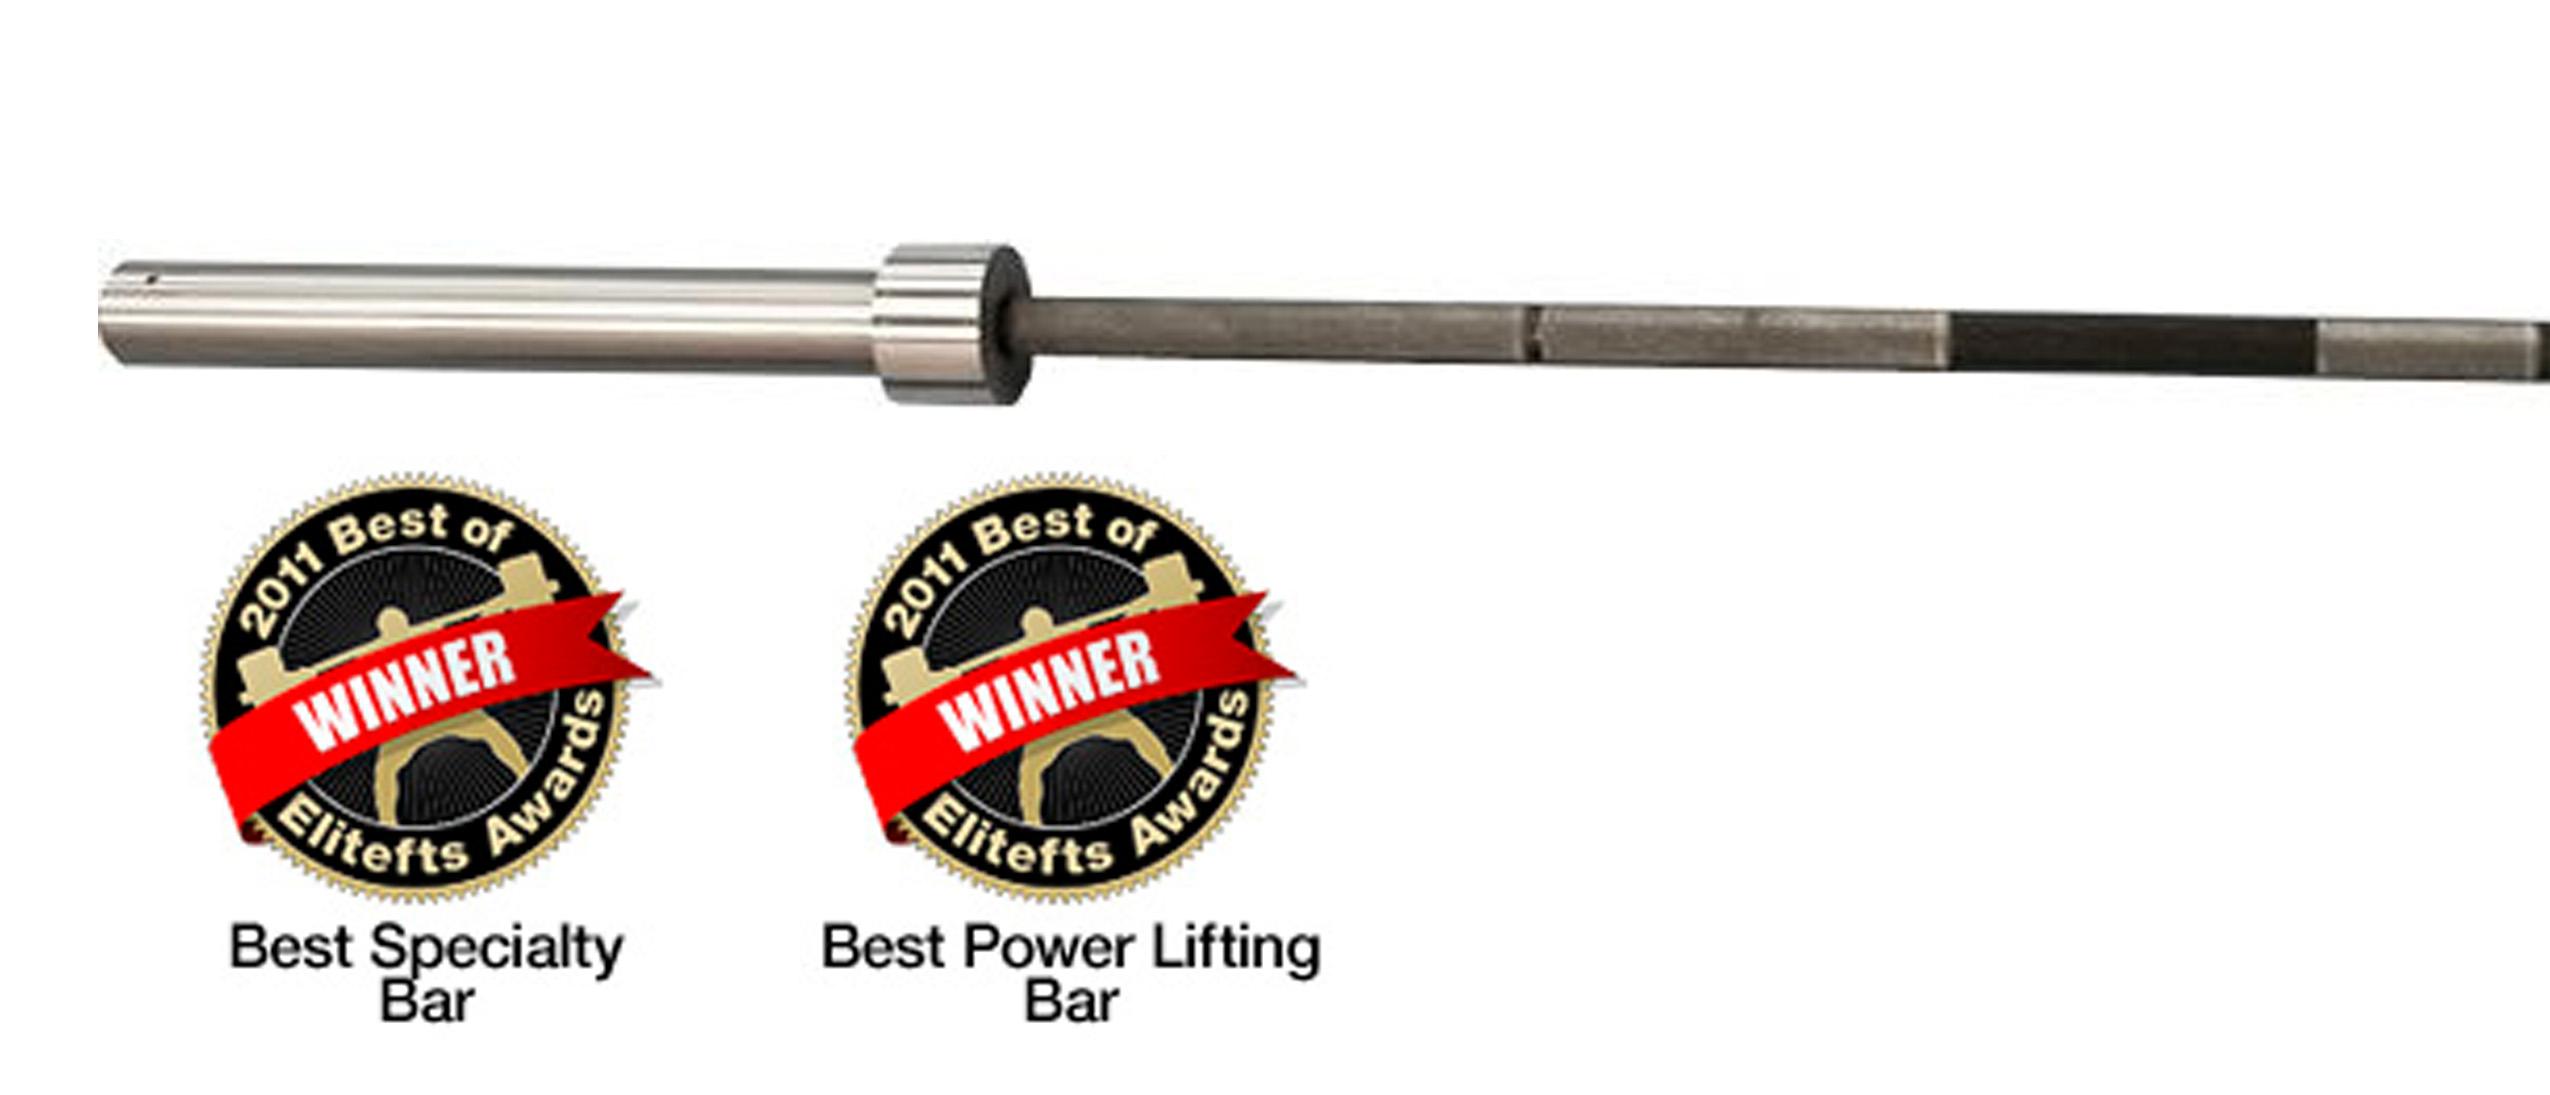 2011 Awards Review: Texas Power Bar